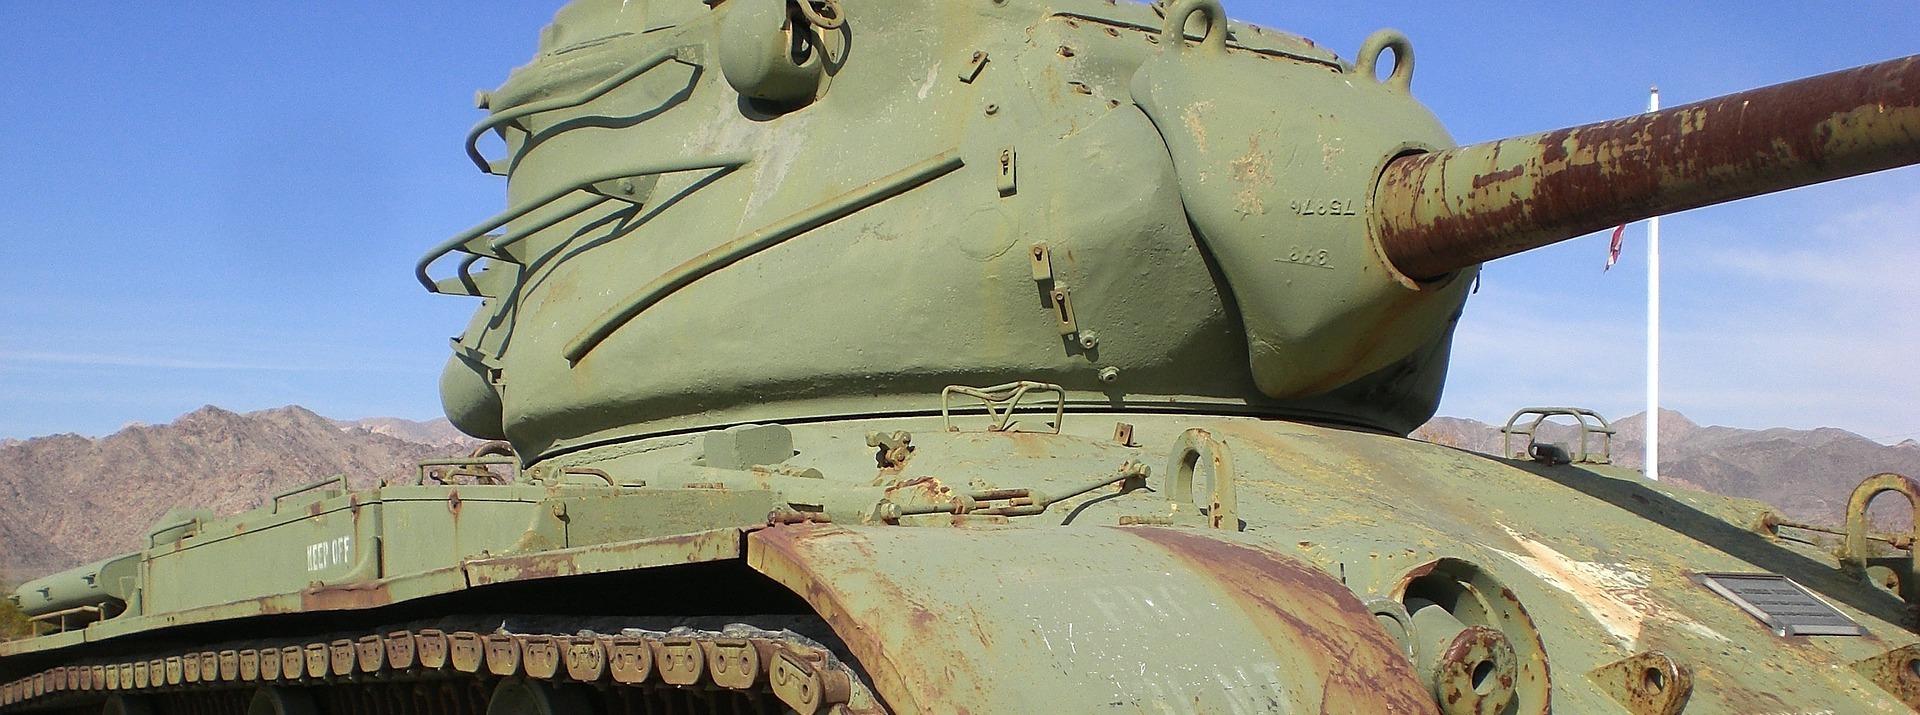 Patton tank 360919 1920